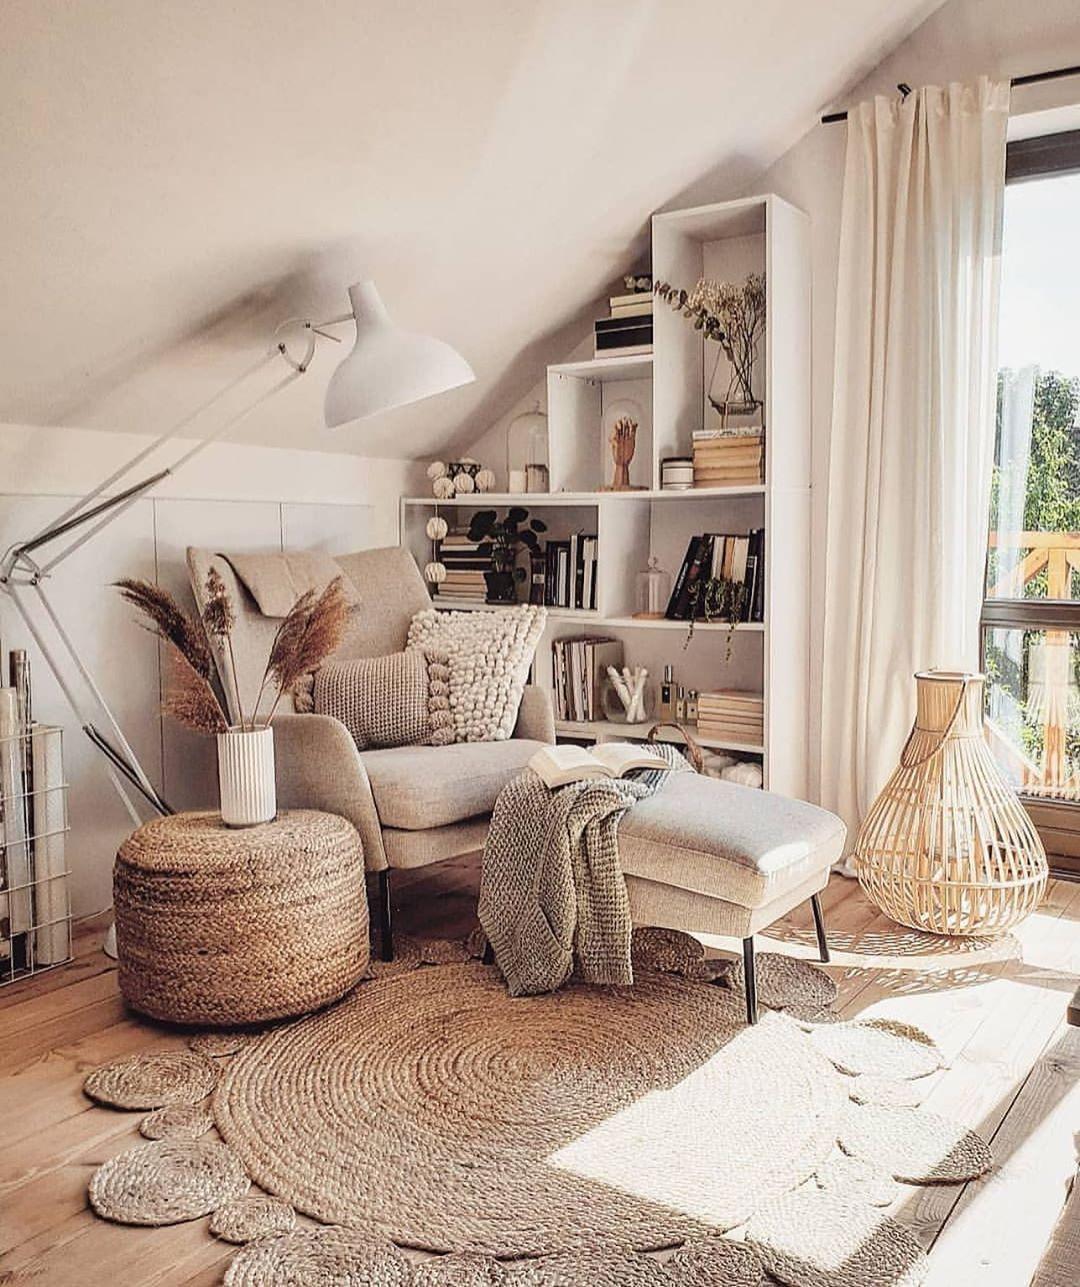 Home Inspiration On Instagram Via Homeinspoe Interiordesign By Marzena Marideko Interi In 2020 Room Inspiration Cheap Home Decor Room Decor